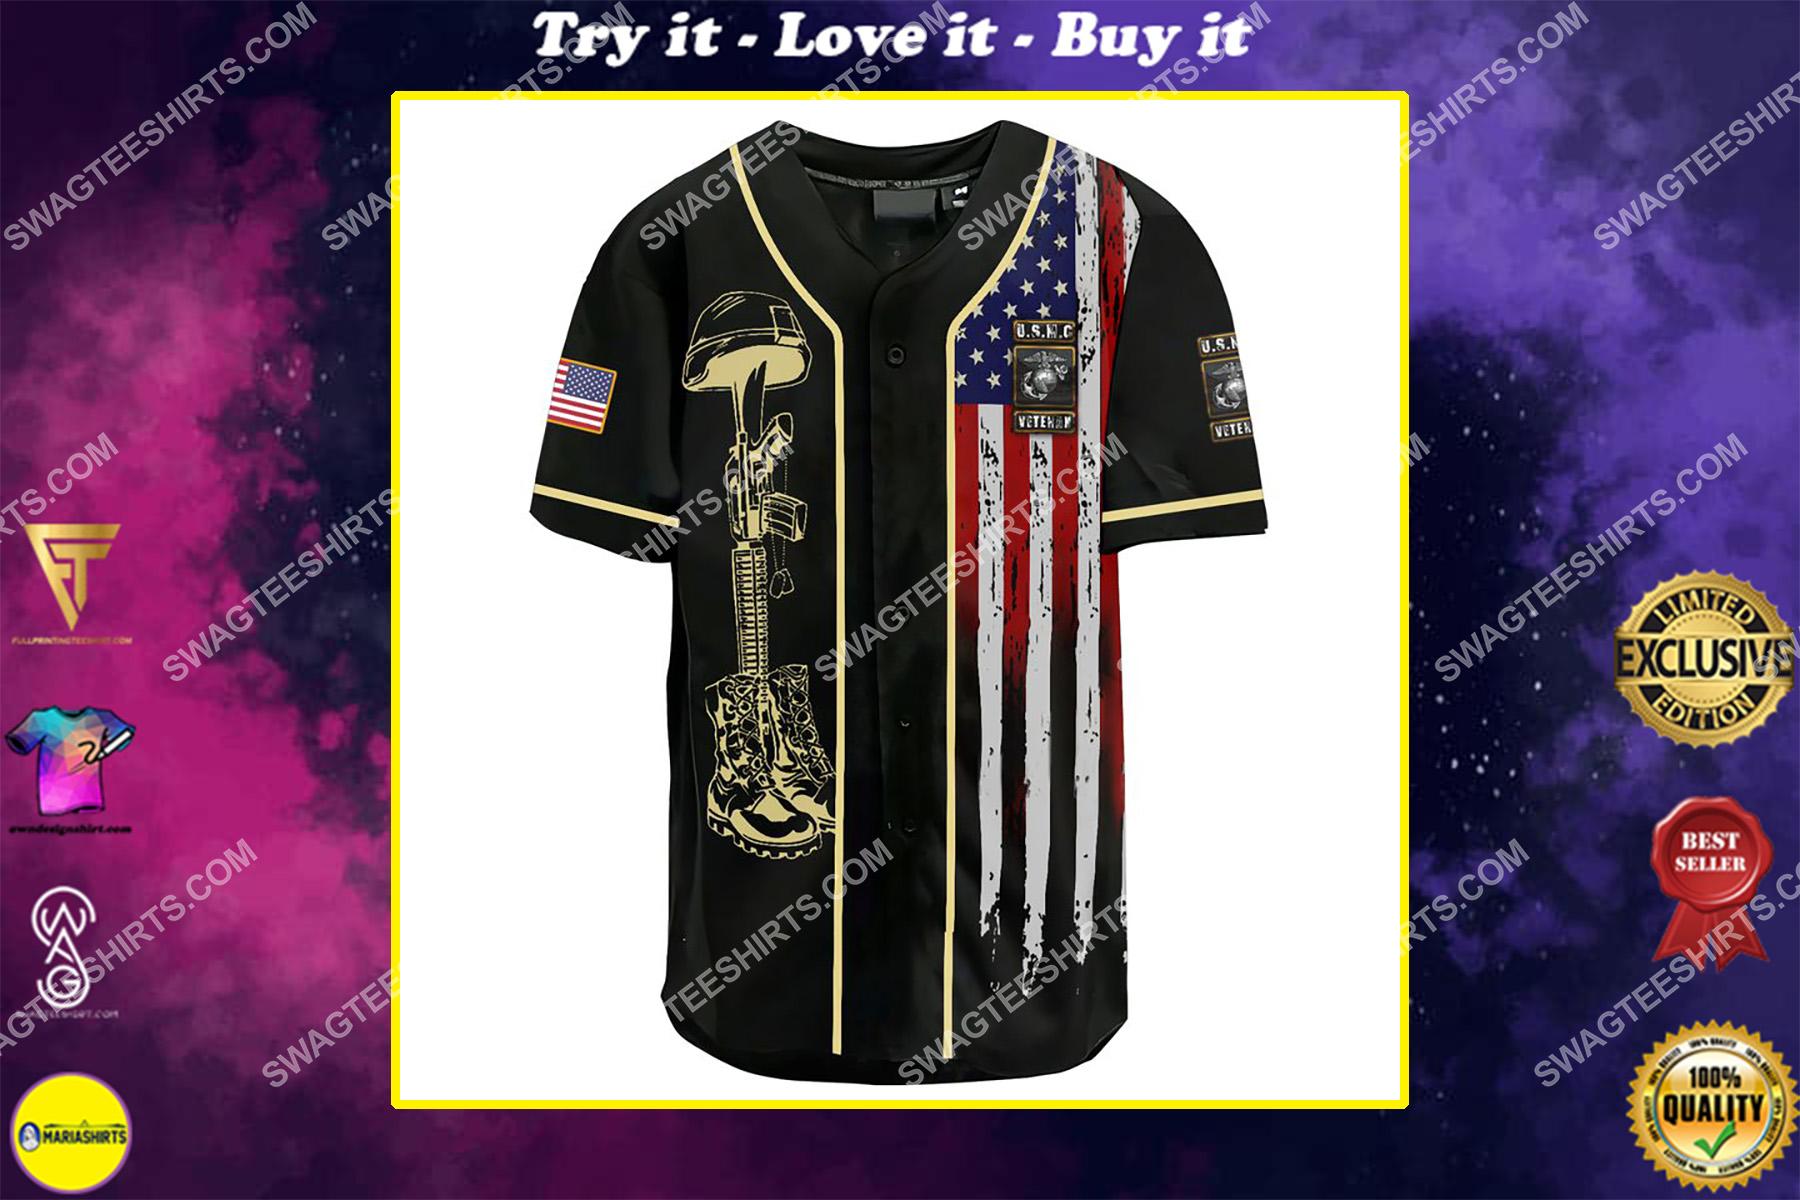 i am a grumpy old marine corps veteran i served i sacrificed i don't regret i am not a hero not a legend baseball shirt